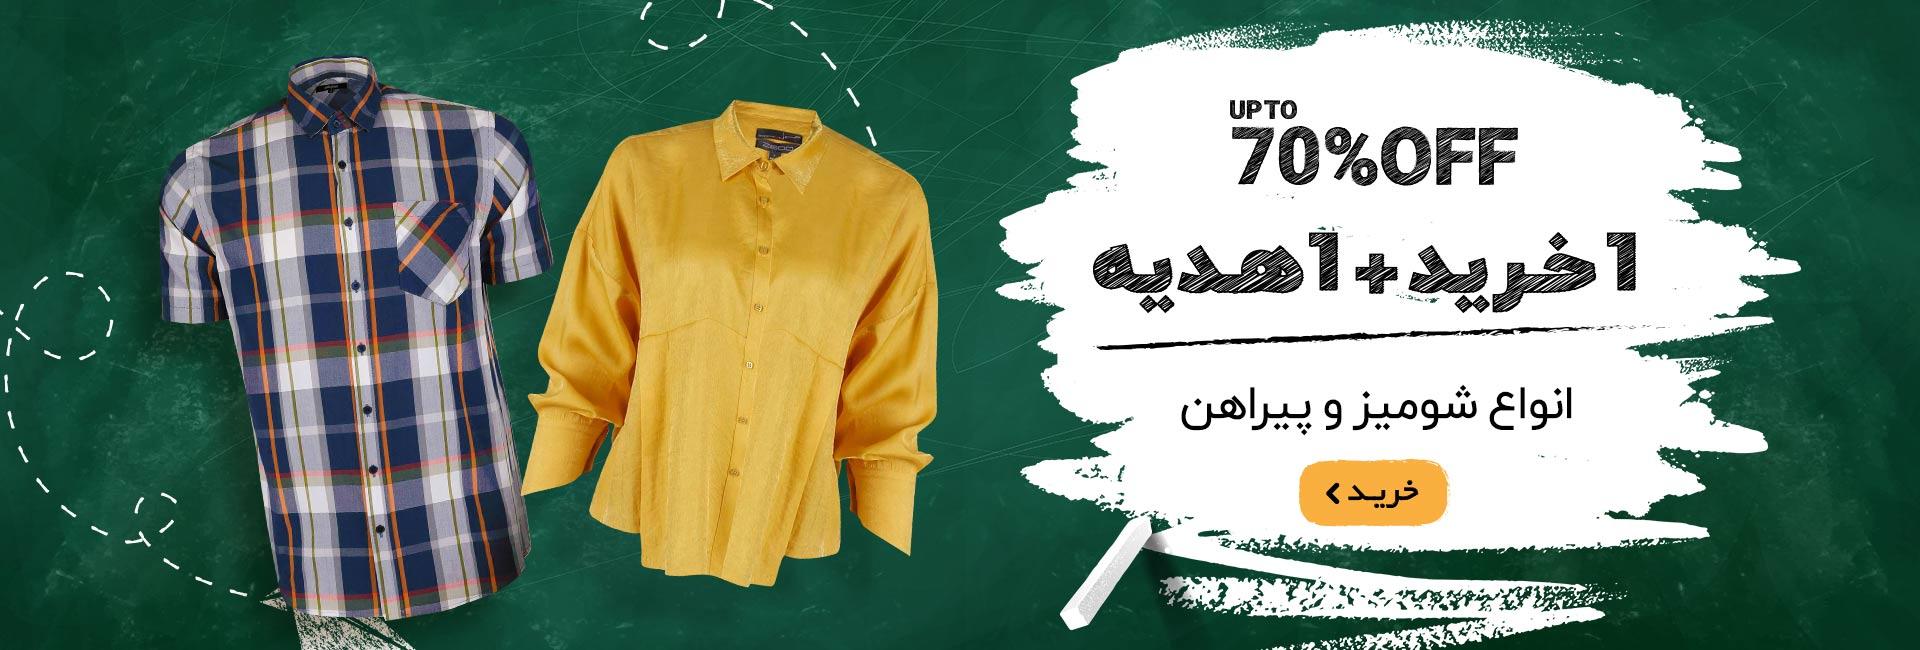 1خرید+1 هدیه ویژه پیراهن و شومیز